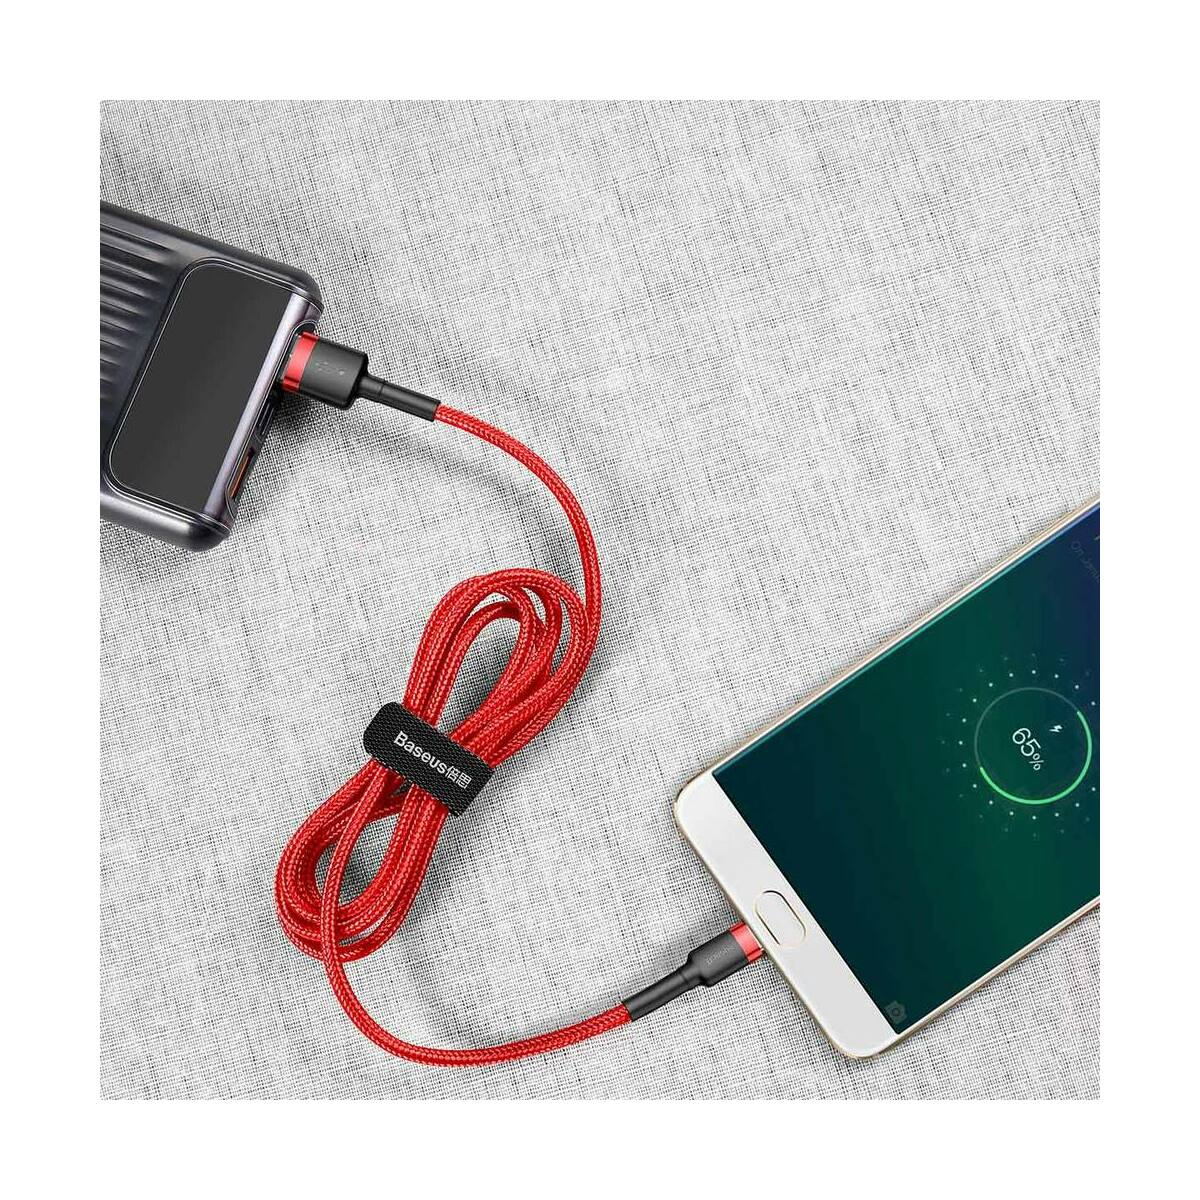 Baseus Micro USB kábel, Cafule 2.4A, 0.5m, piros/piros (CAMKLF-A09)